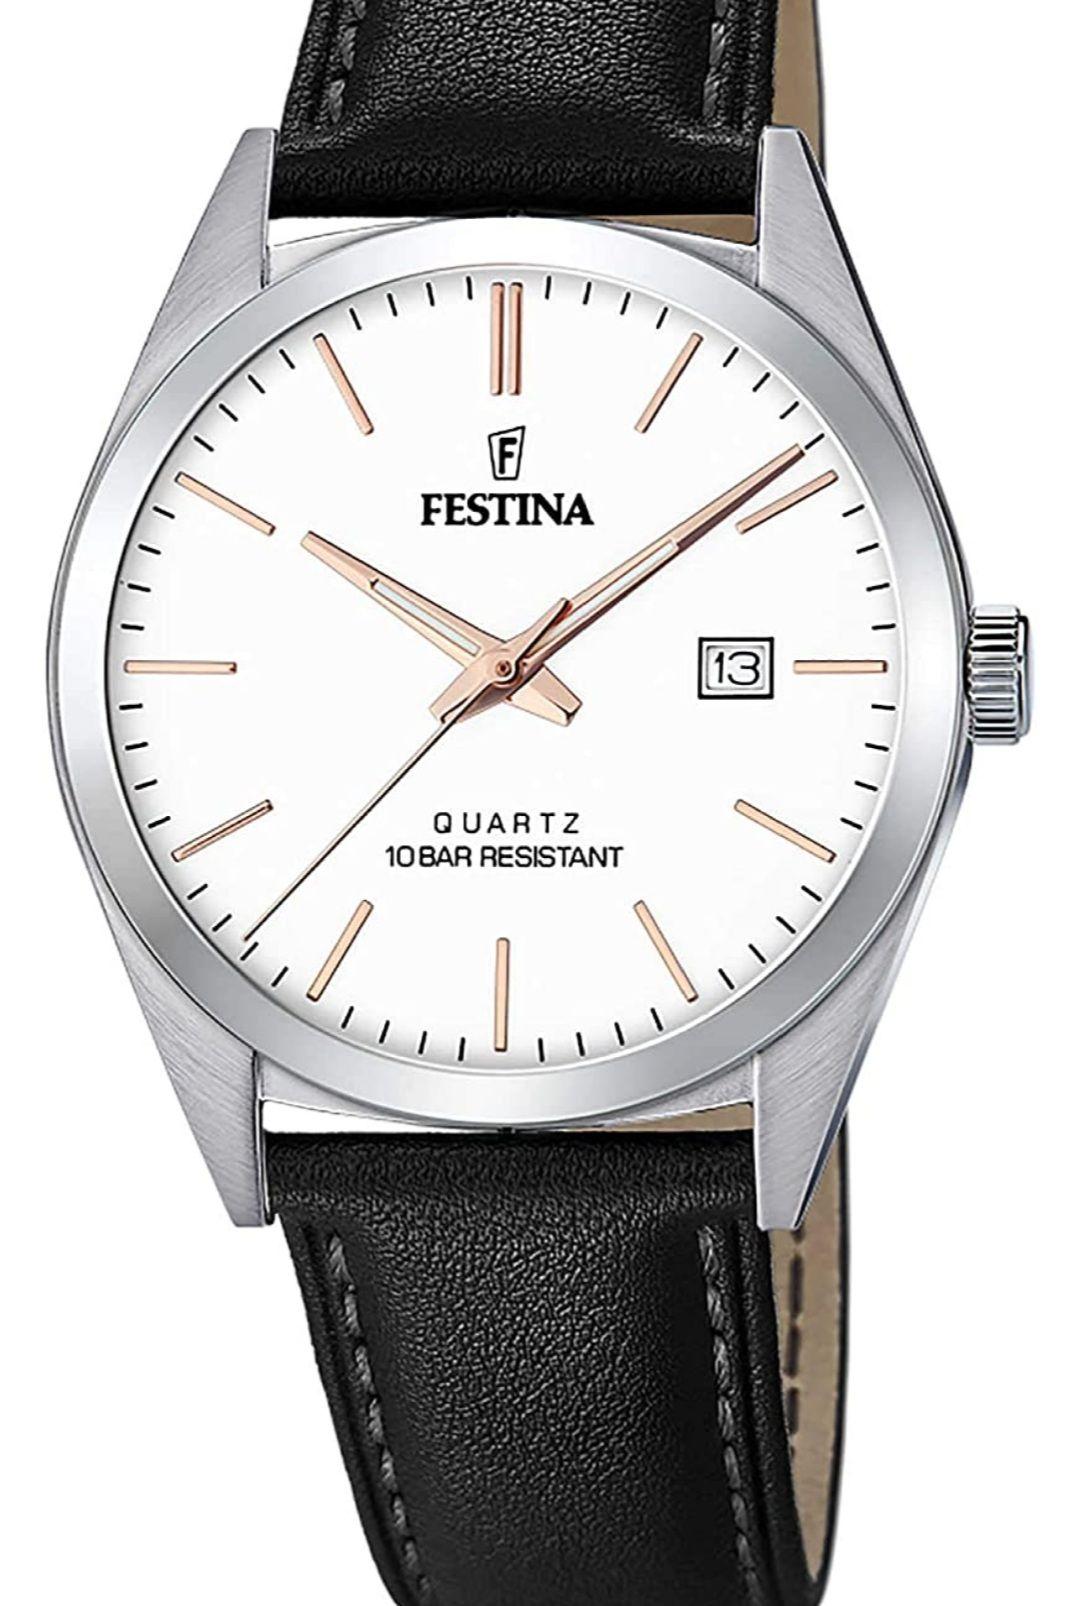 Reloj Festina (Envio e impuestos incluidos)